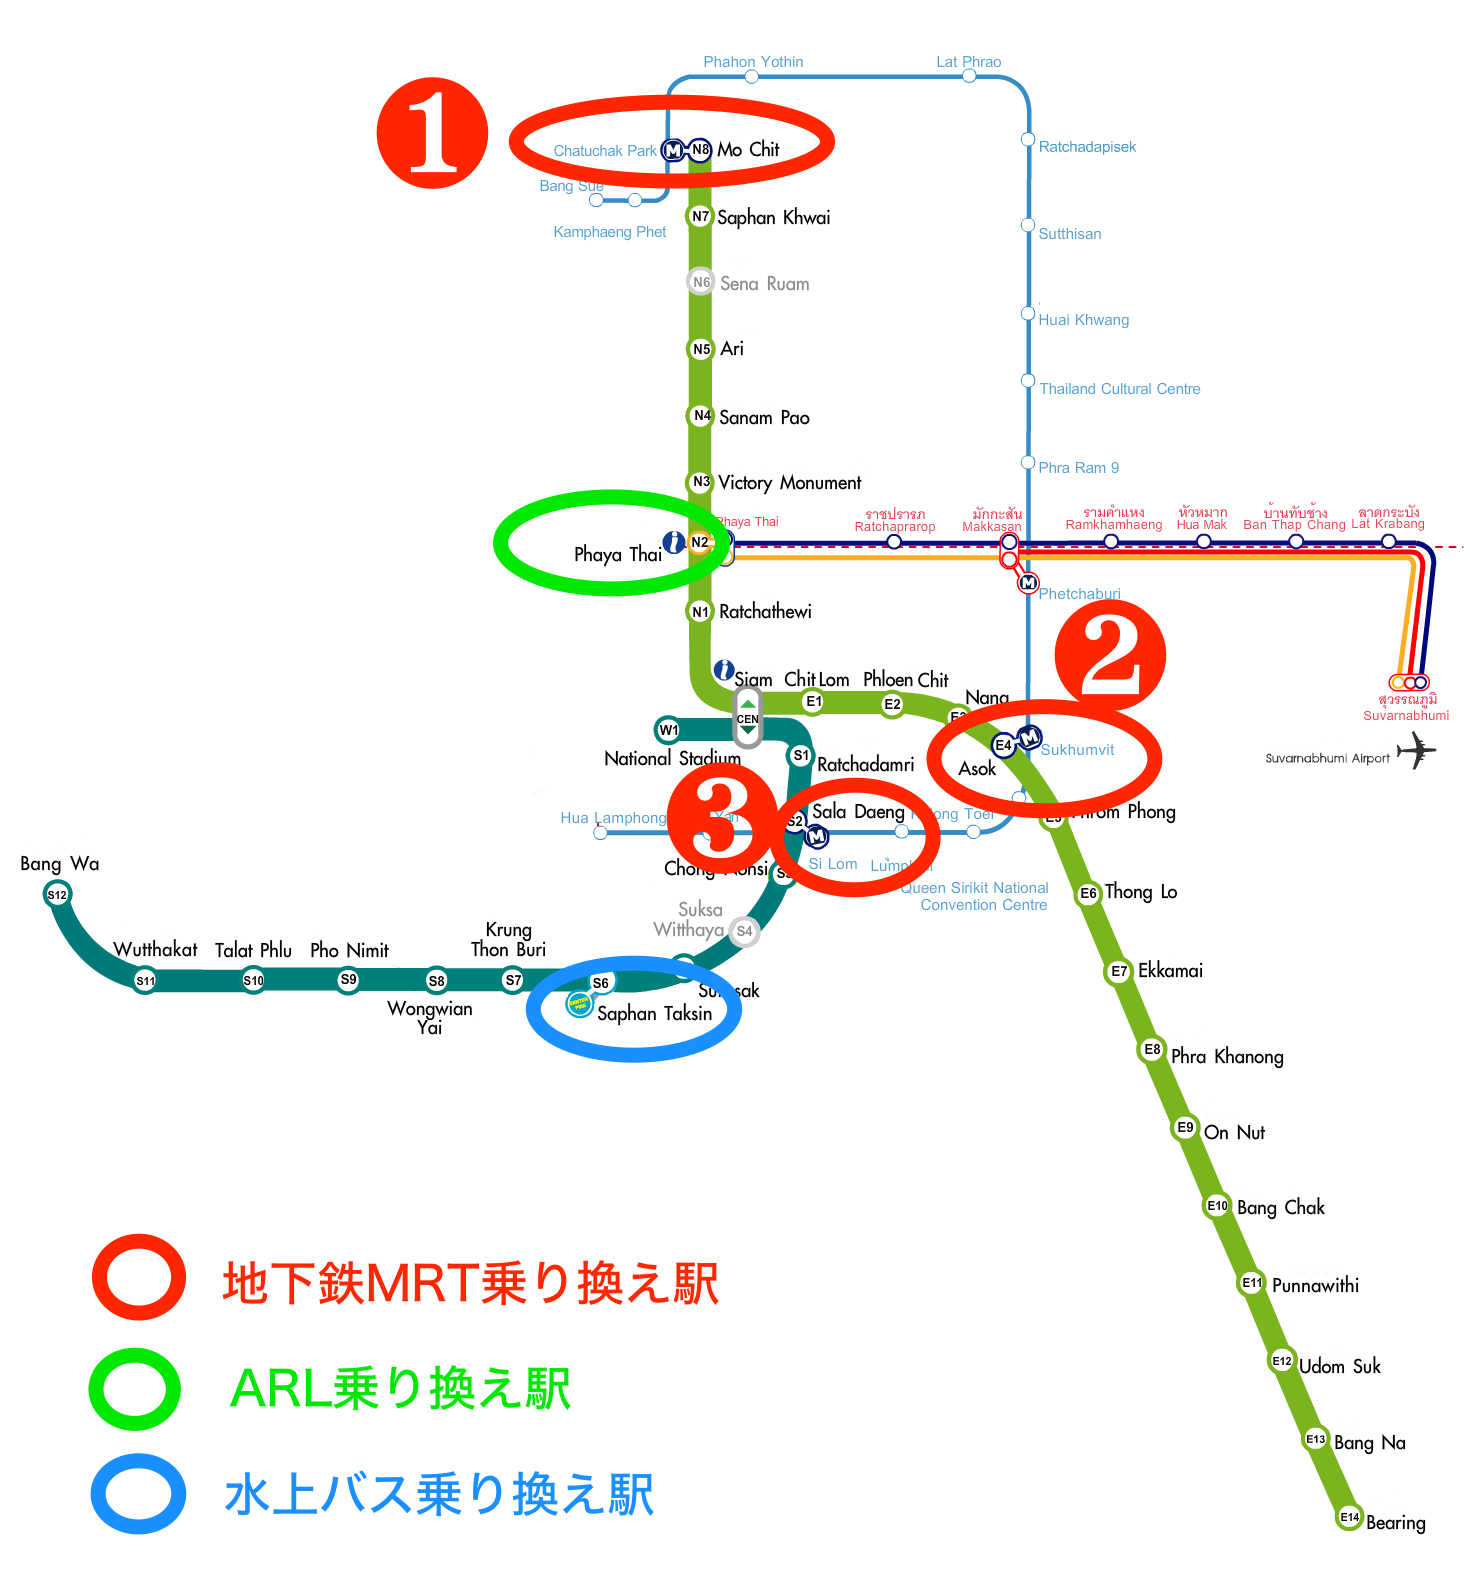 MRTmap-bkk-thai4